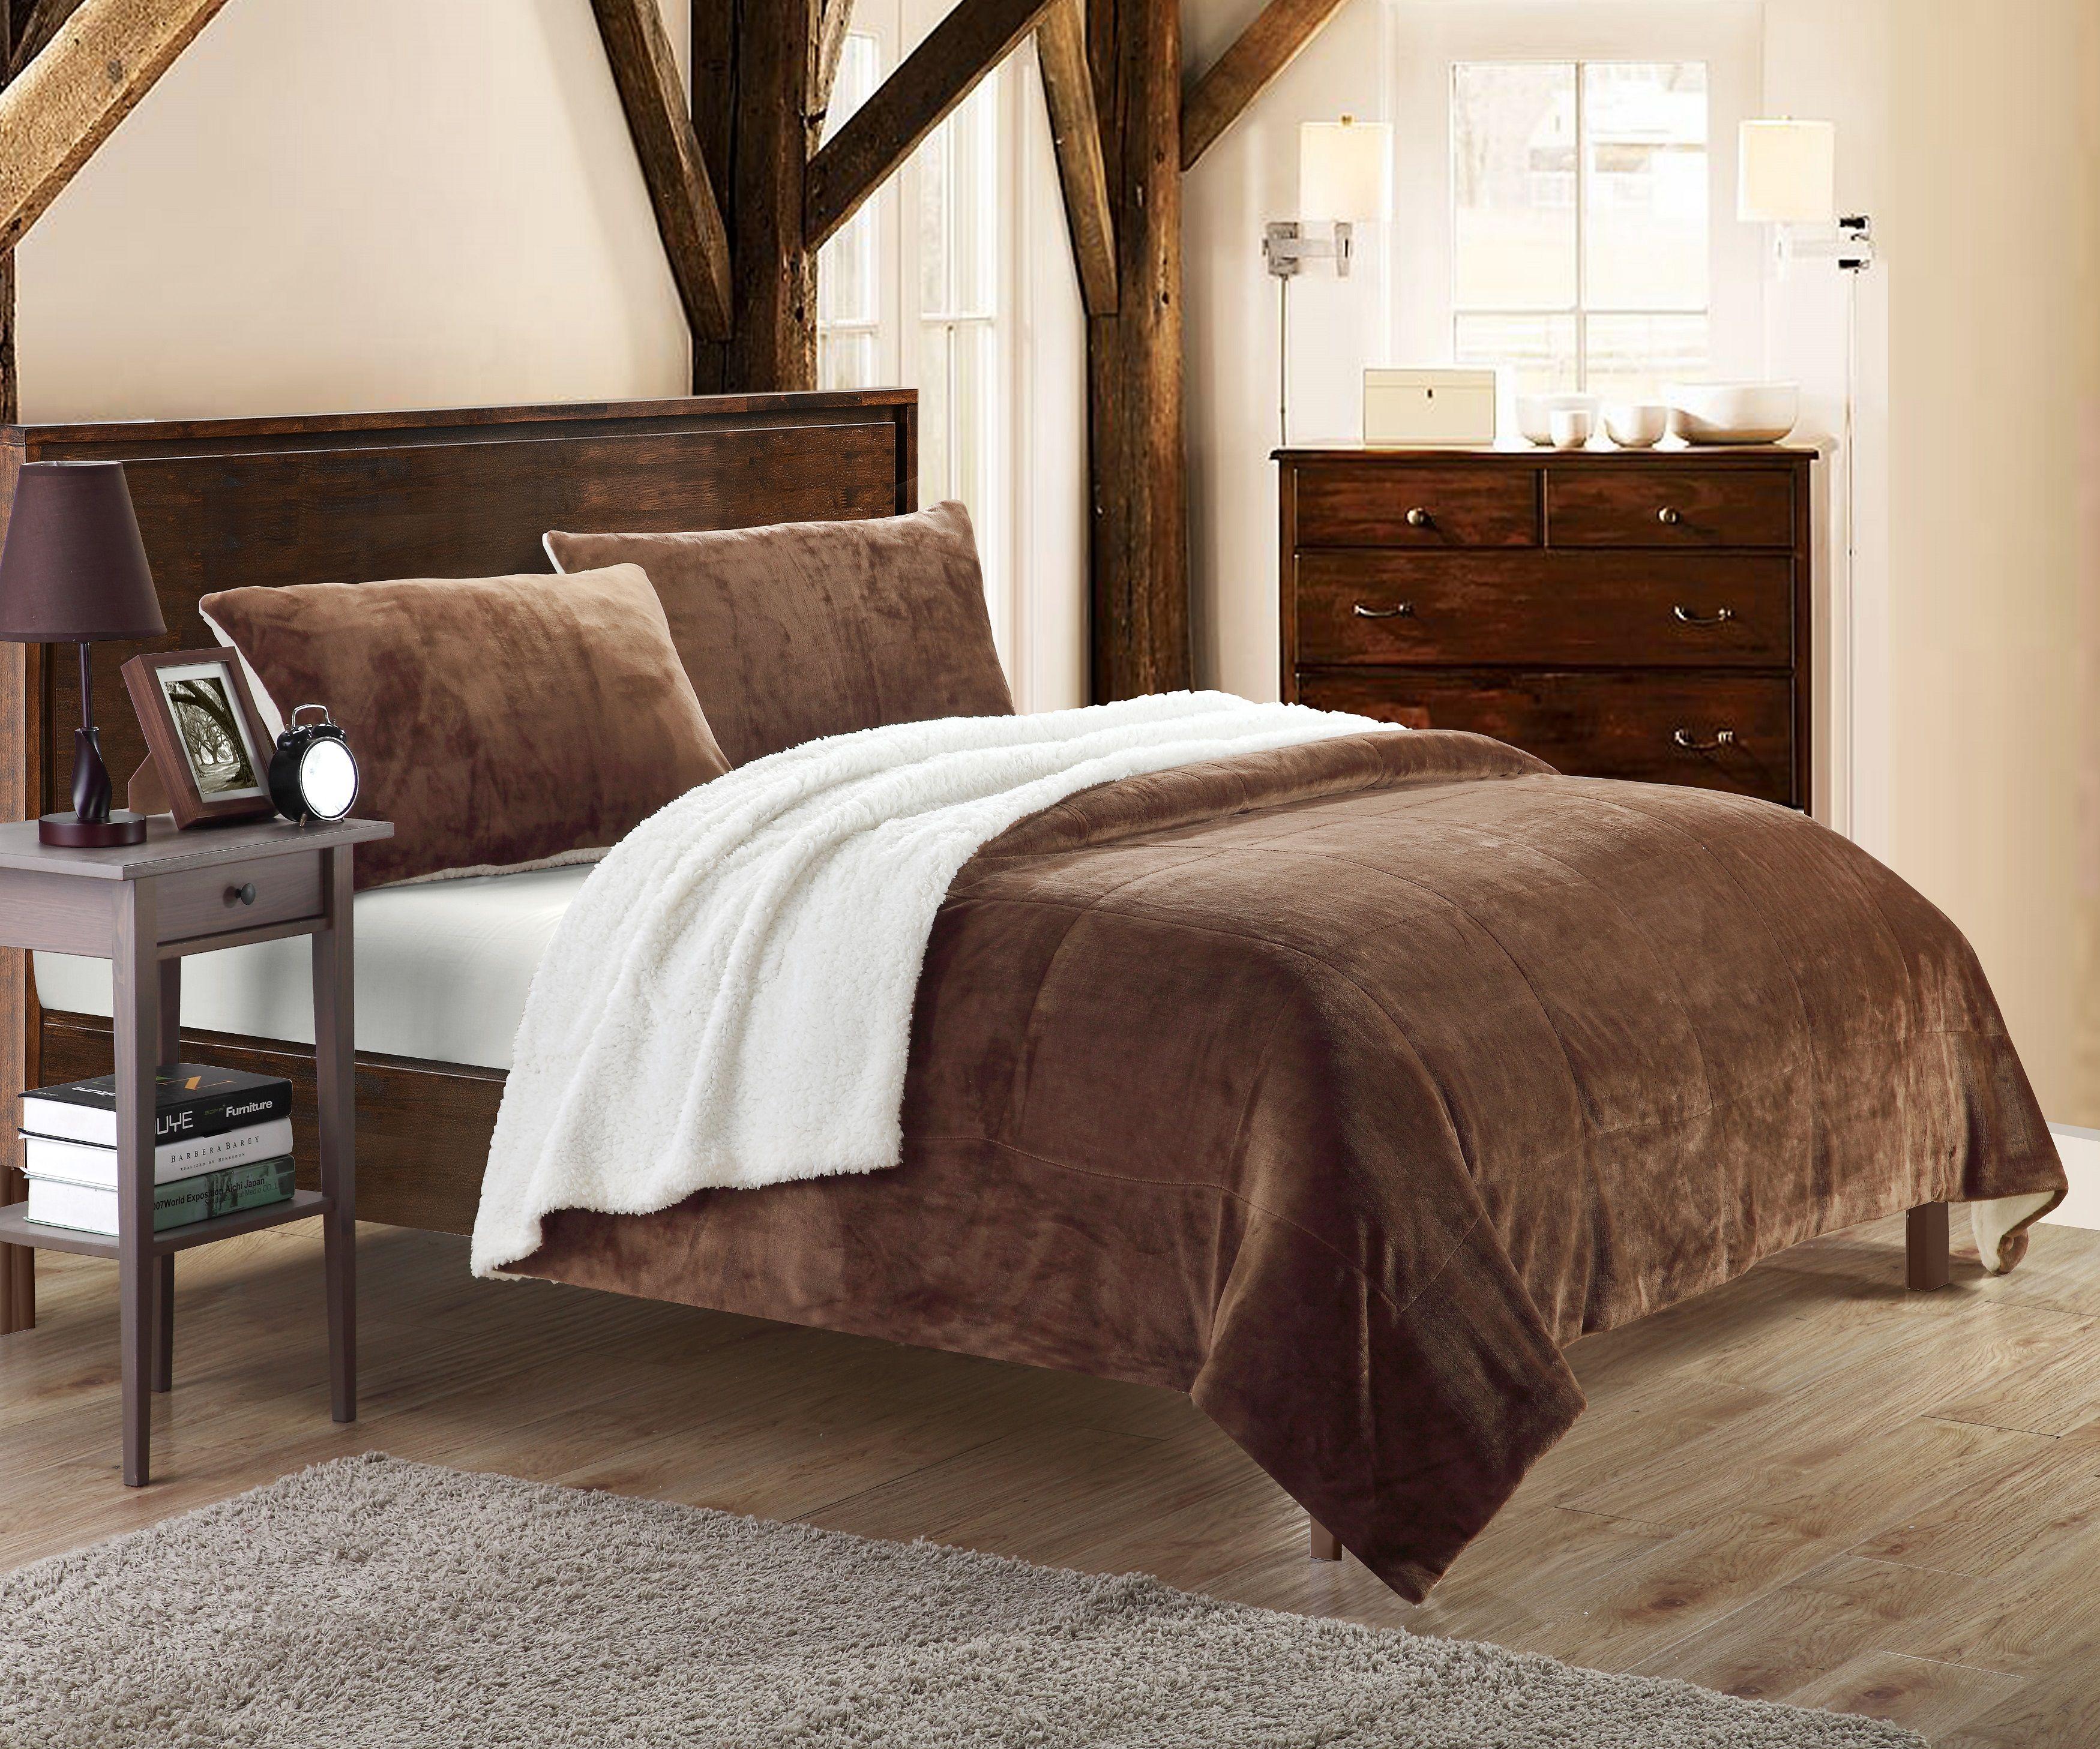 blanket king amazon throw bellahome snow dp home leopard com fur faux comforter safari kitchen plush